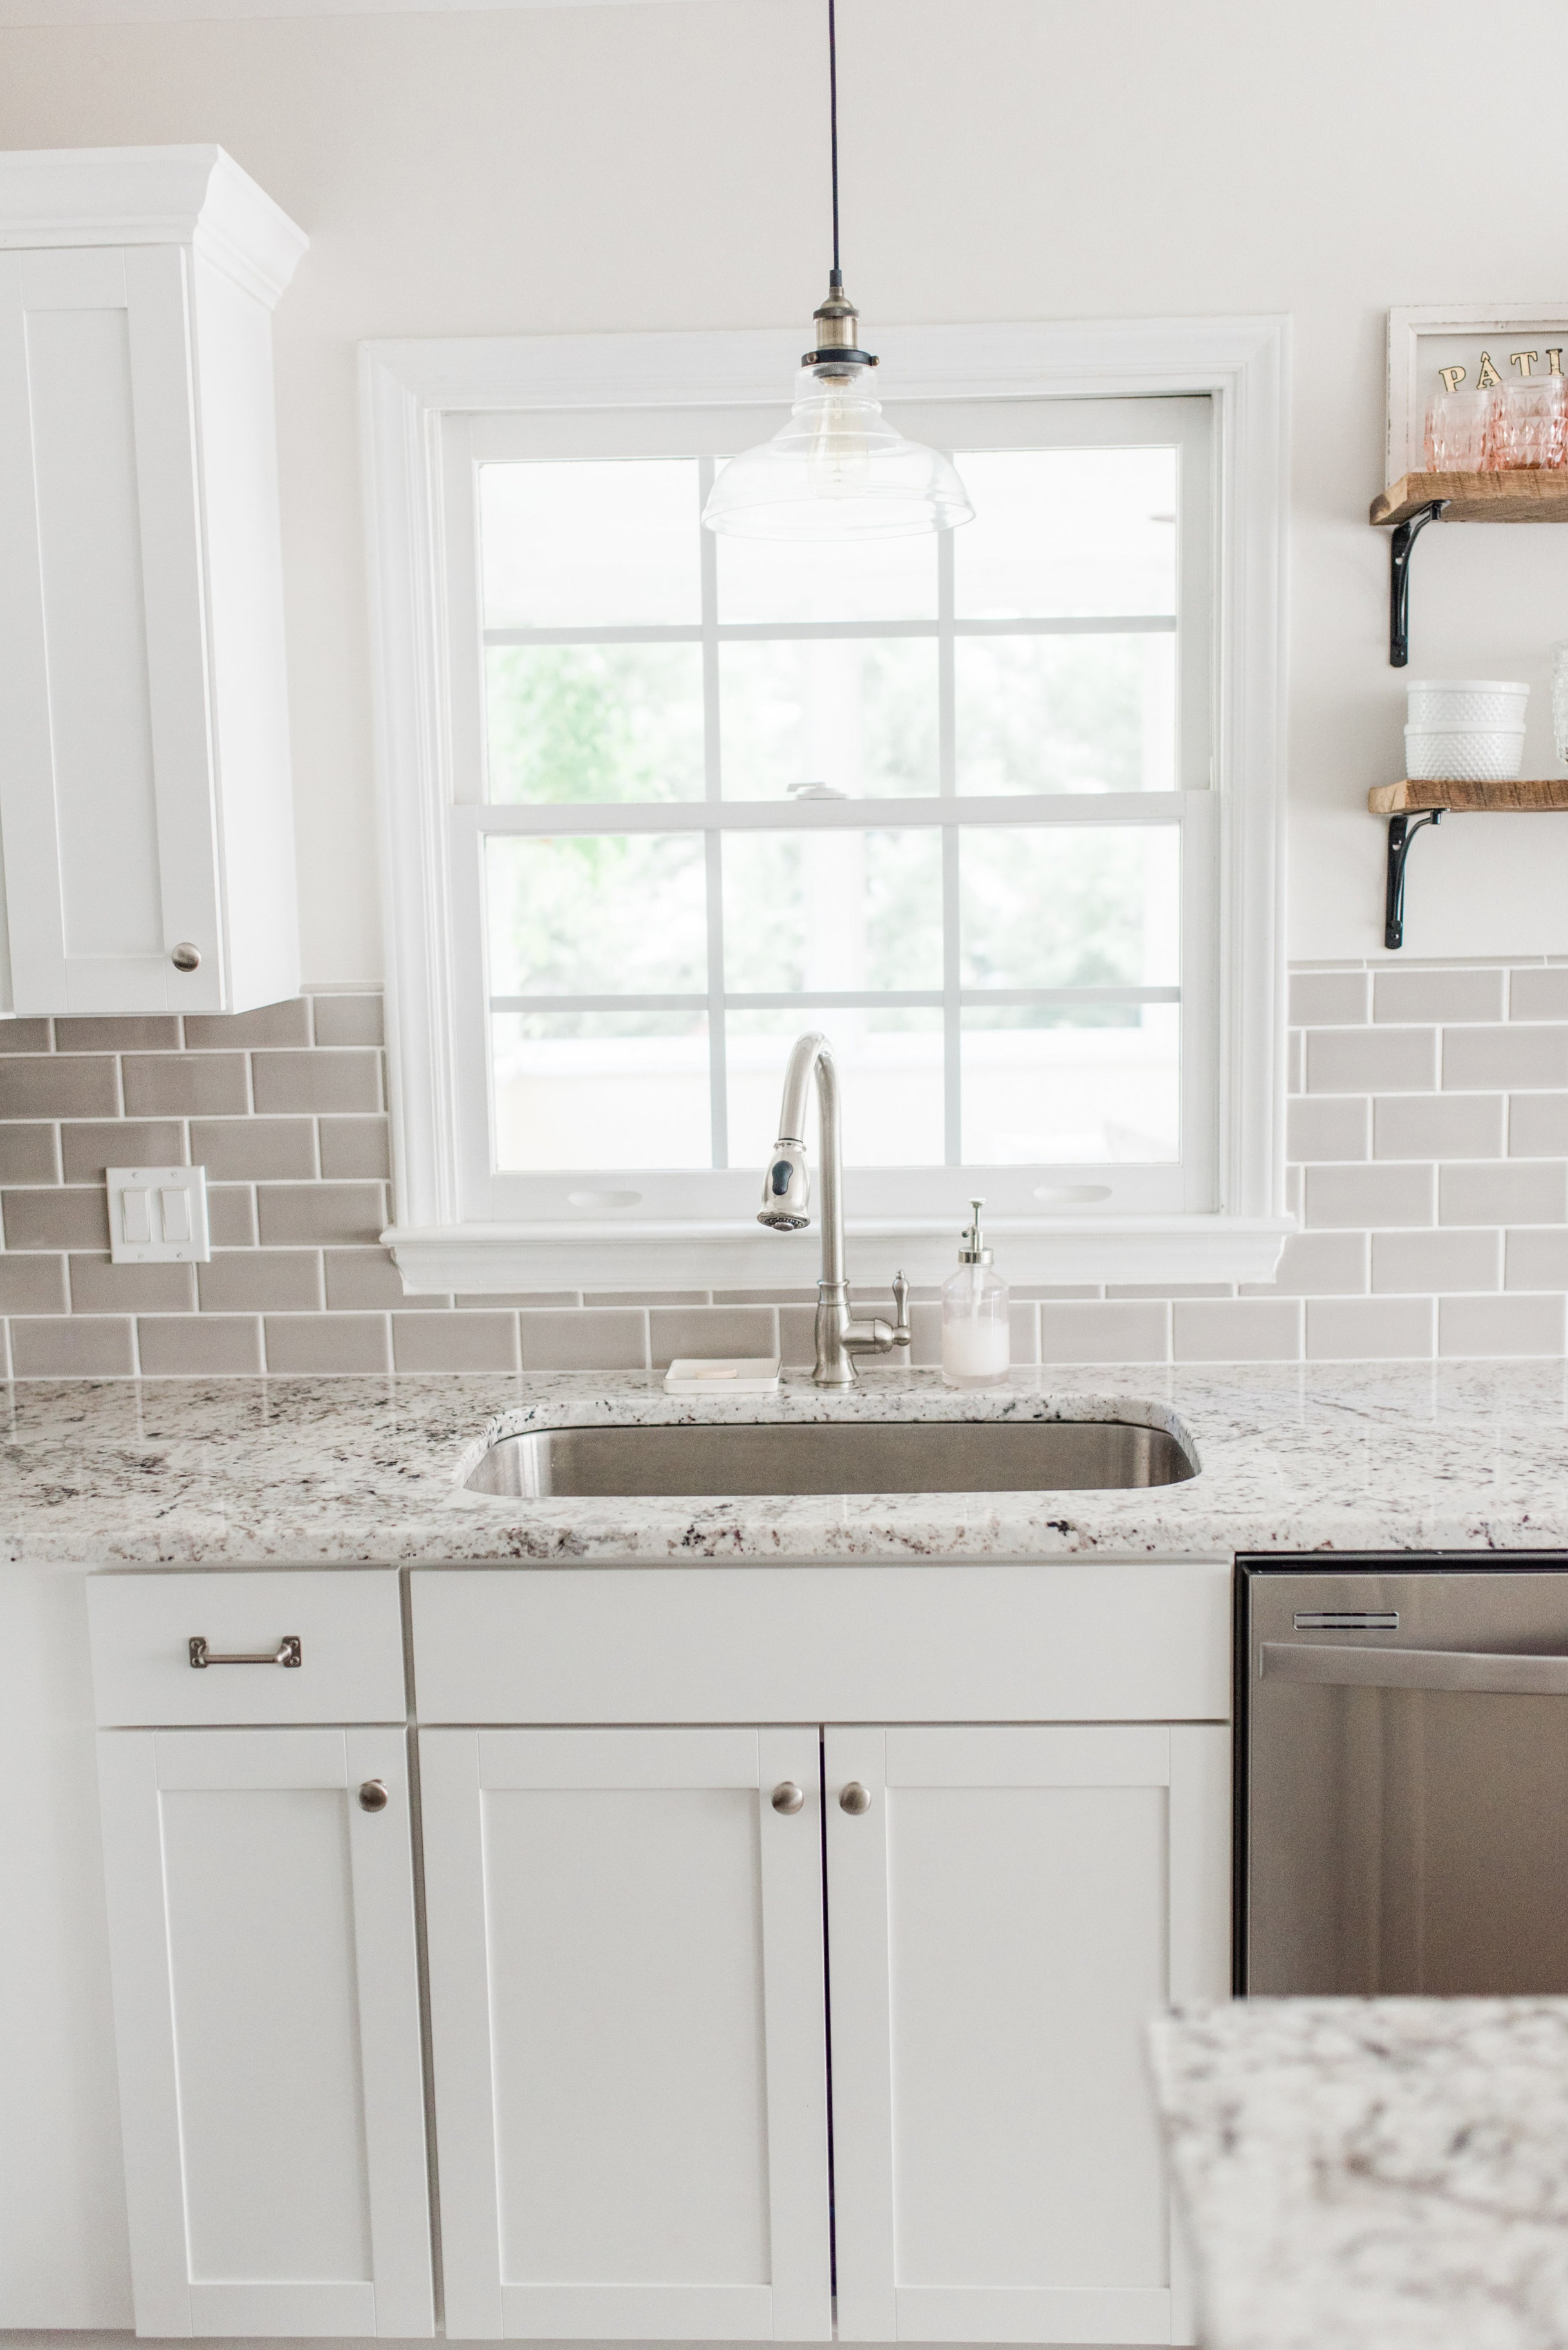 Lowe S Stock Cabinets Review Diamond Now Arcadia White Shaker Cabinets Elizabeth Burns Design Raleigh Nc Interior Designer